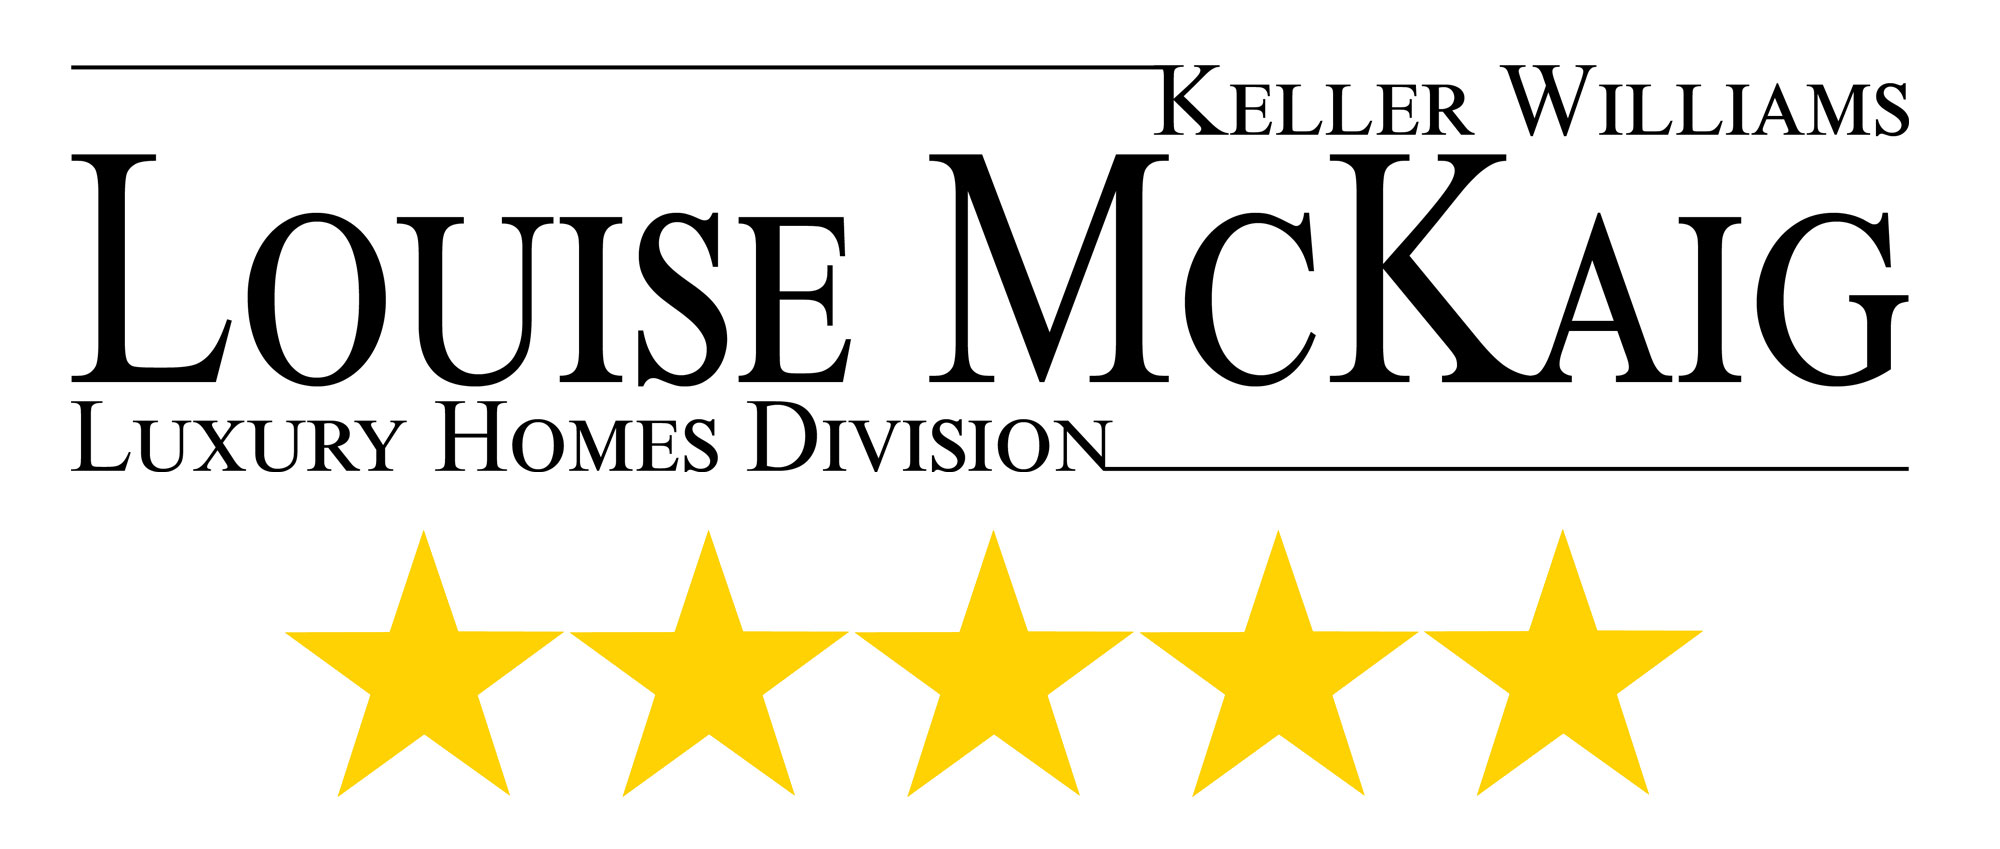 real estate agent reviews, realtor reviews, real estate reviews